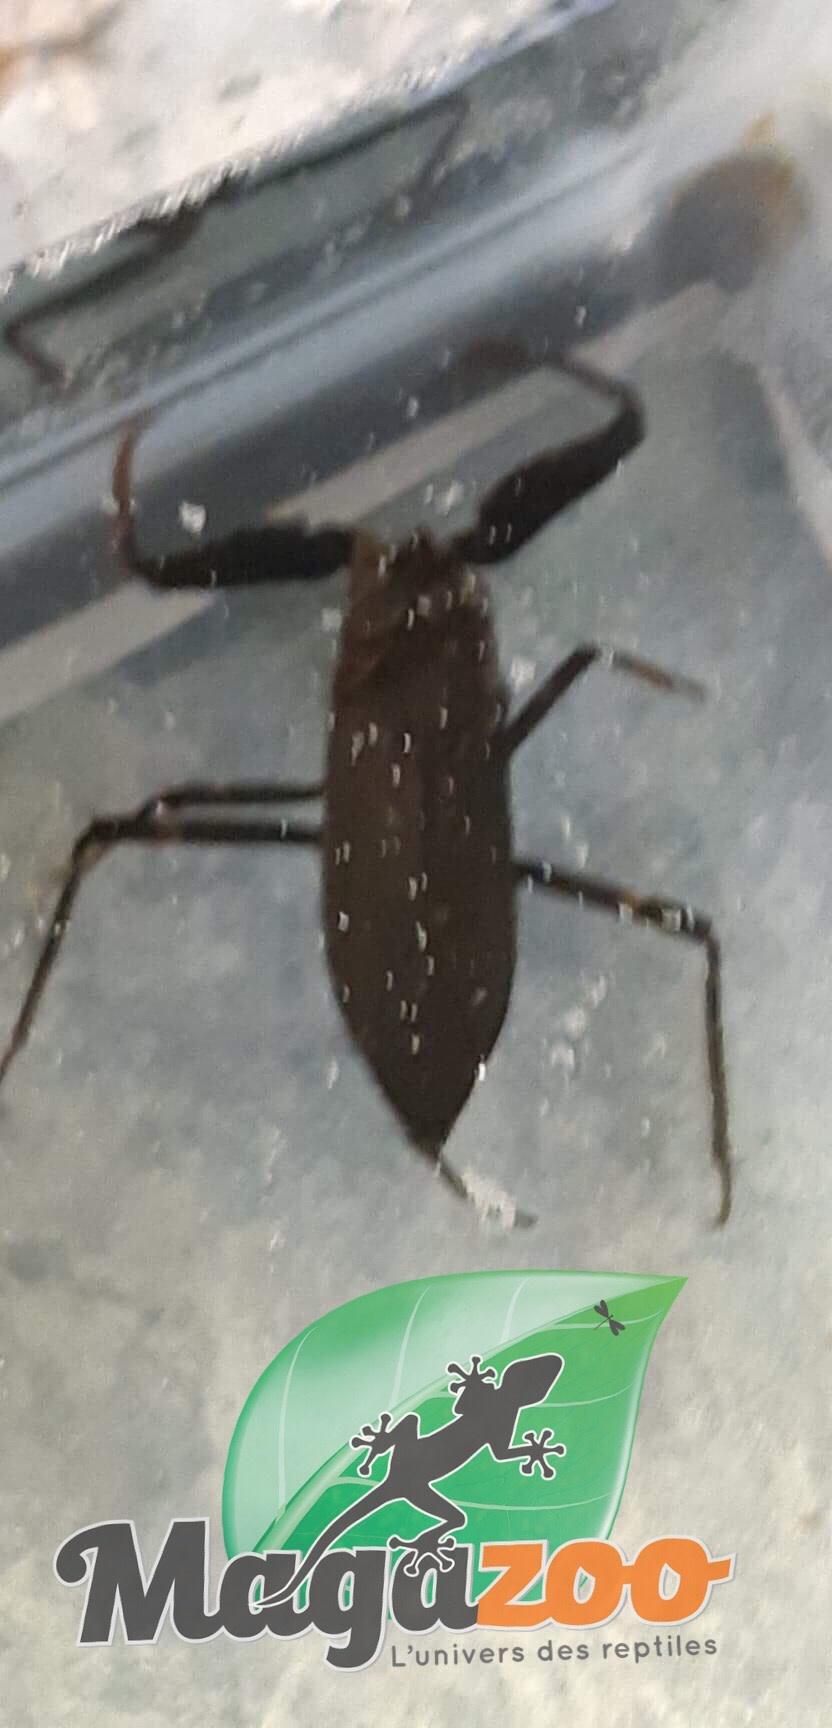 Magazoo Nèpe cendrée (Malaisie)/Nepa cinerea